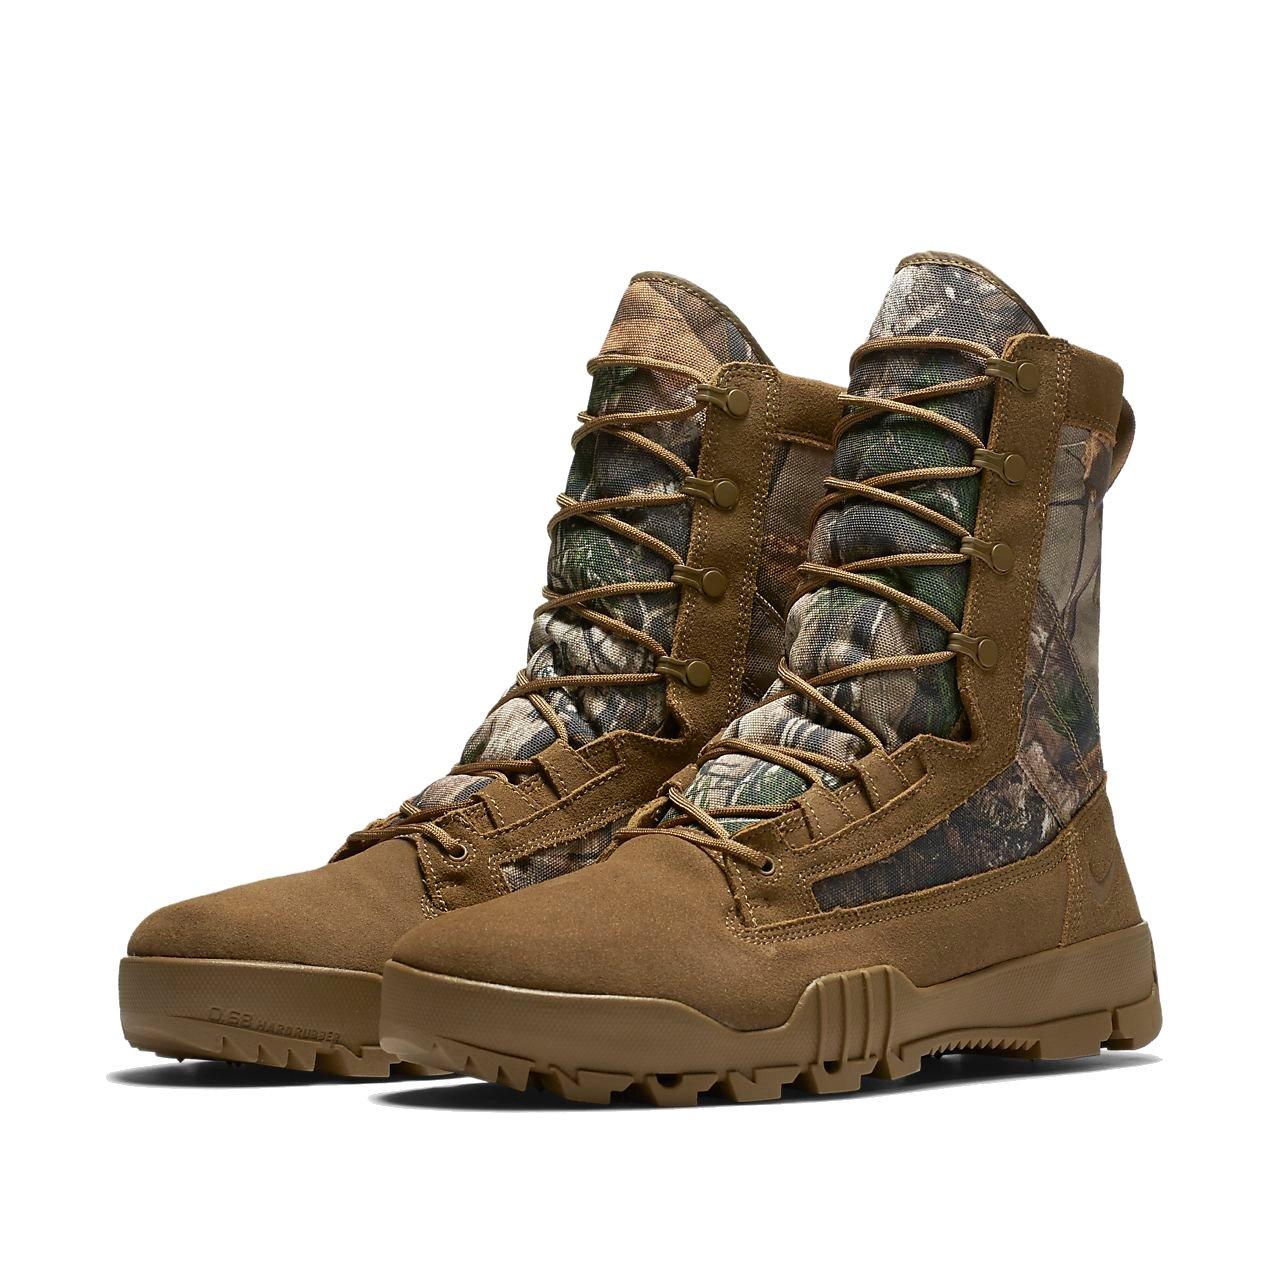 Nike Mens SFB 8'' Jungle RealTree Boot Coyoye/Coyote 845168-990 (12 M US)